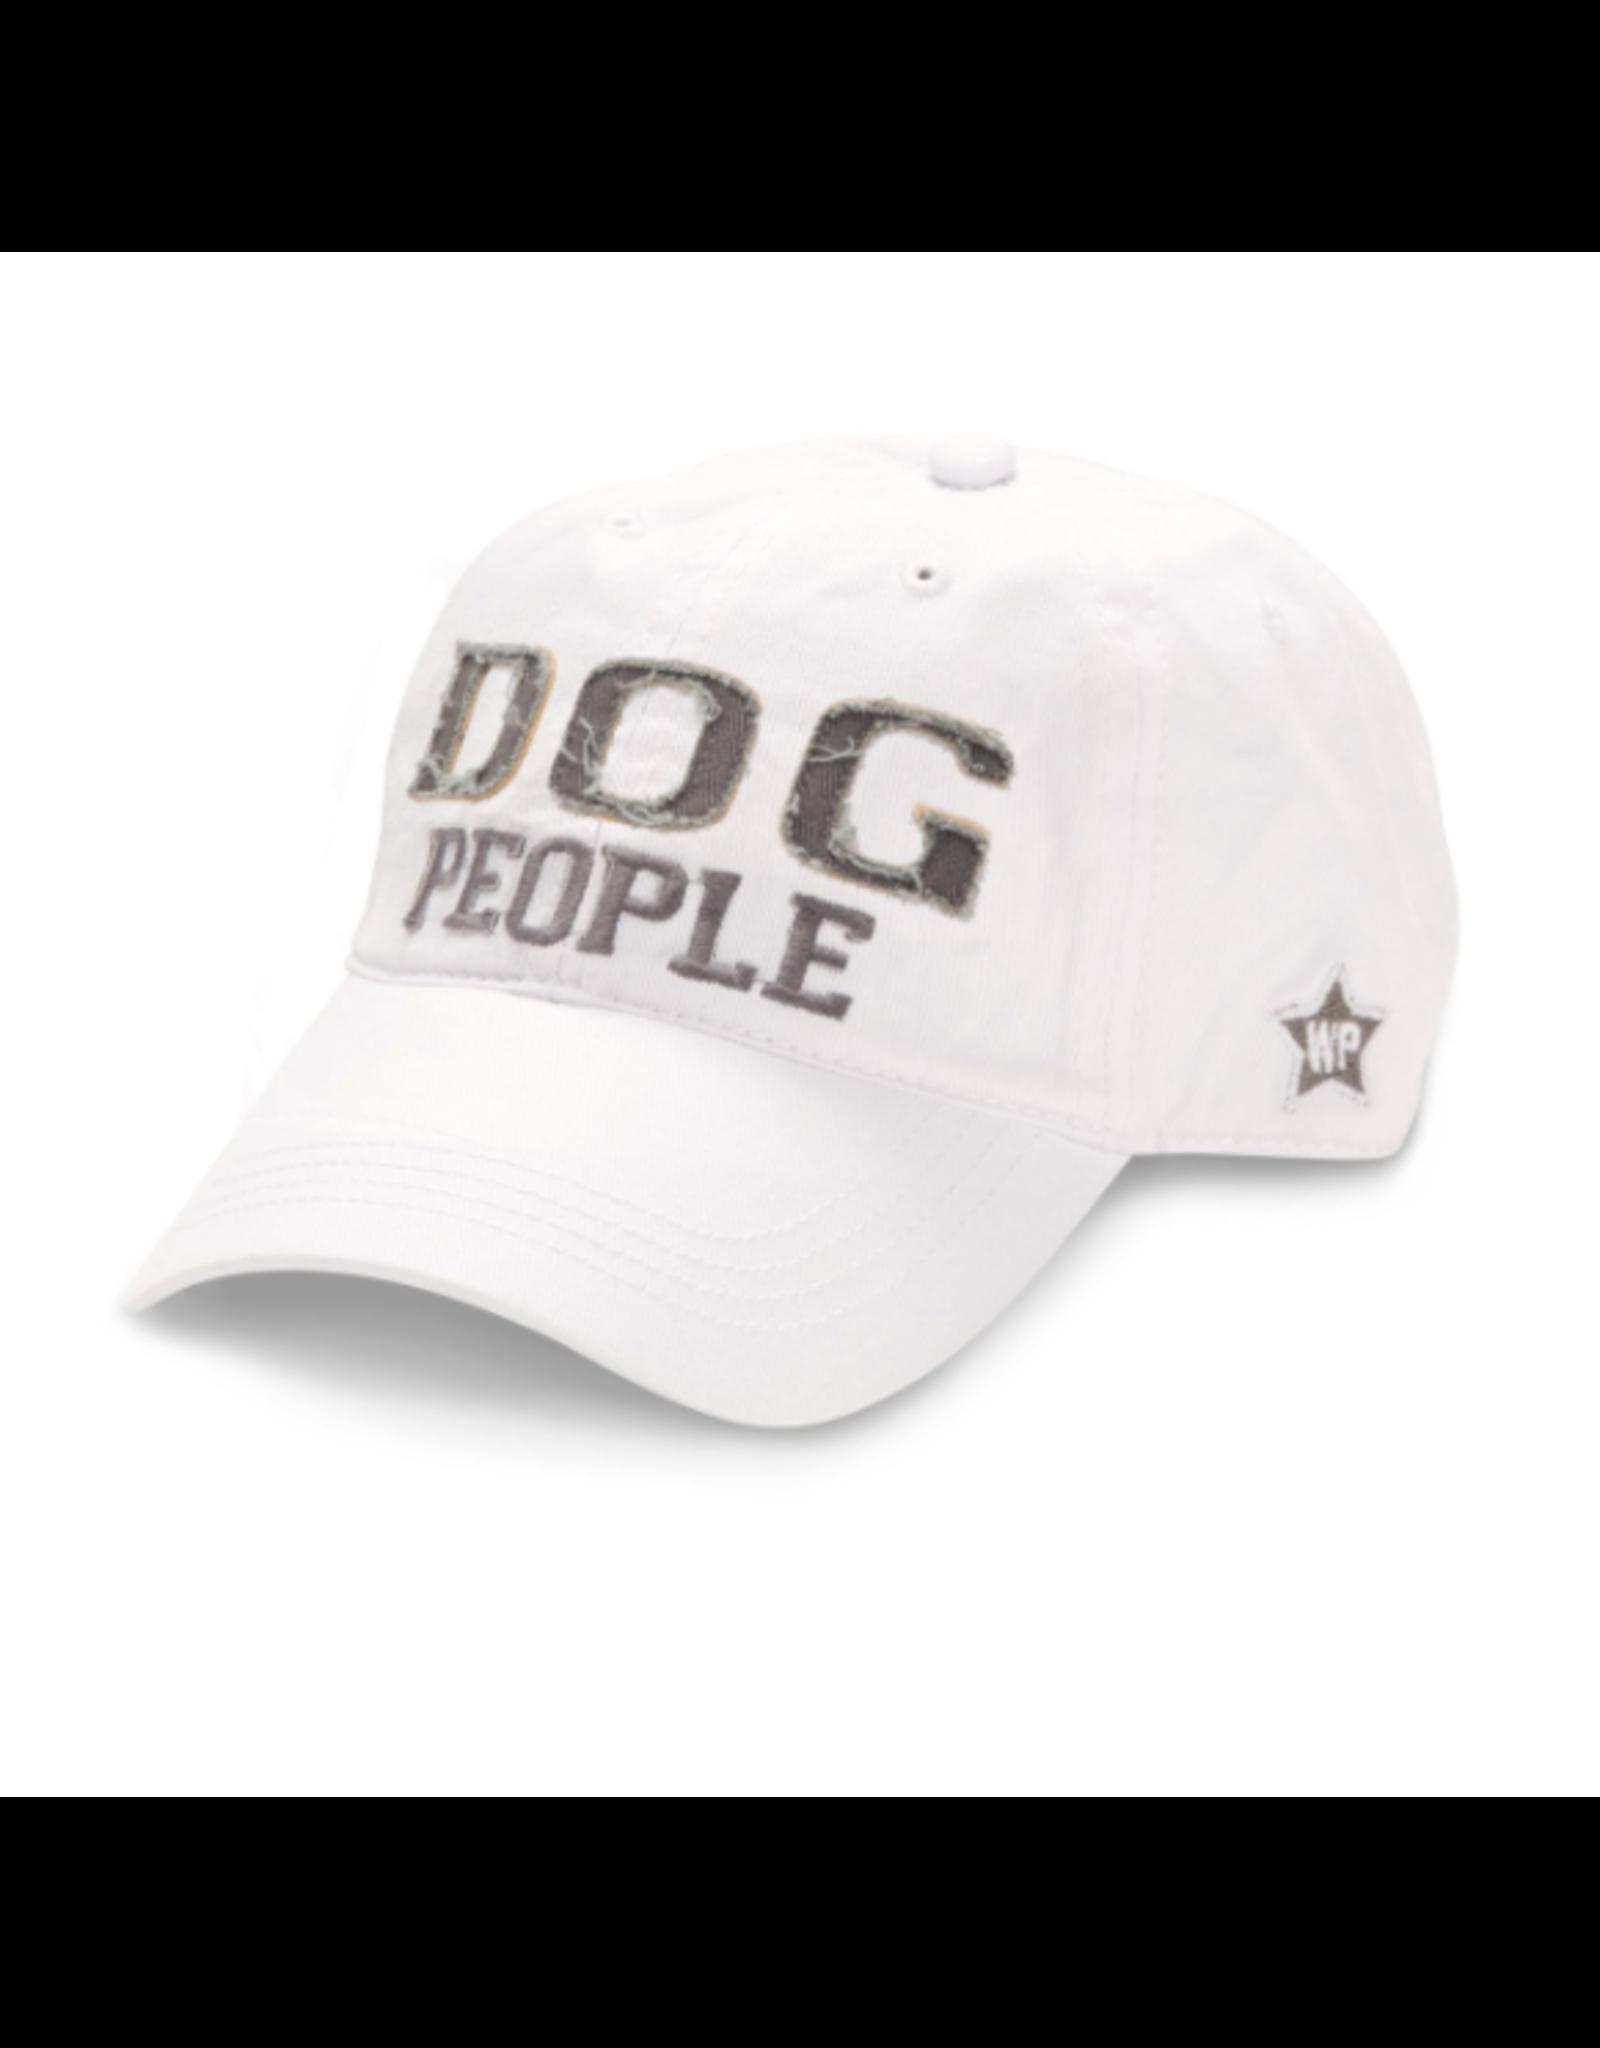 Dog People Ball Hat, white